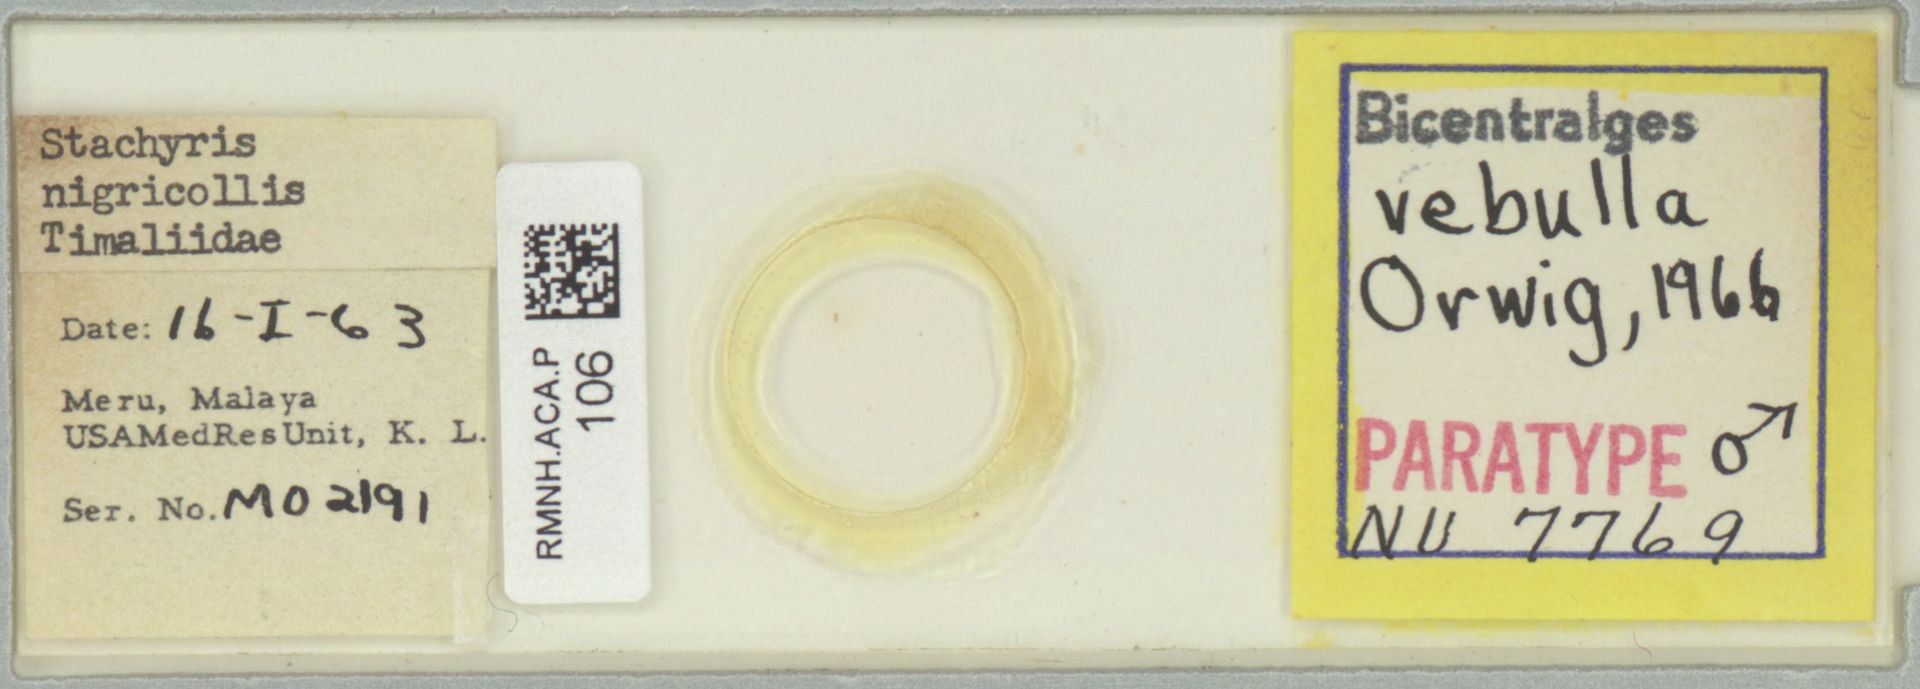 RMNH.ACA.P.106 | Bicentralges vebulla Orwig, 1966